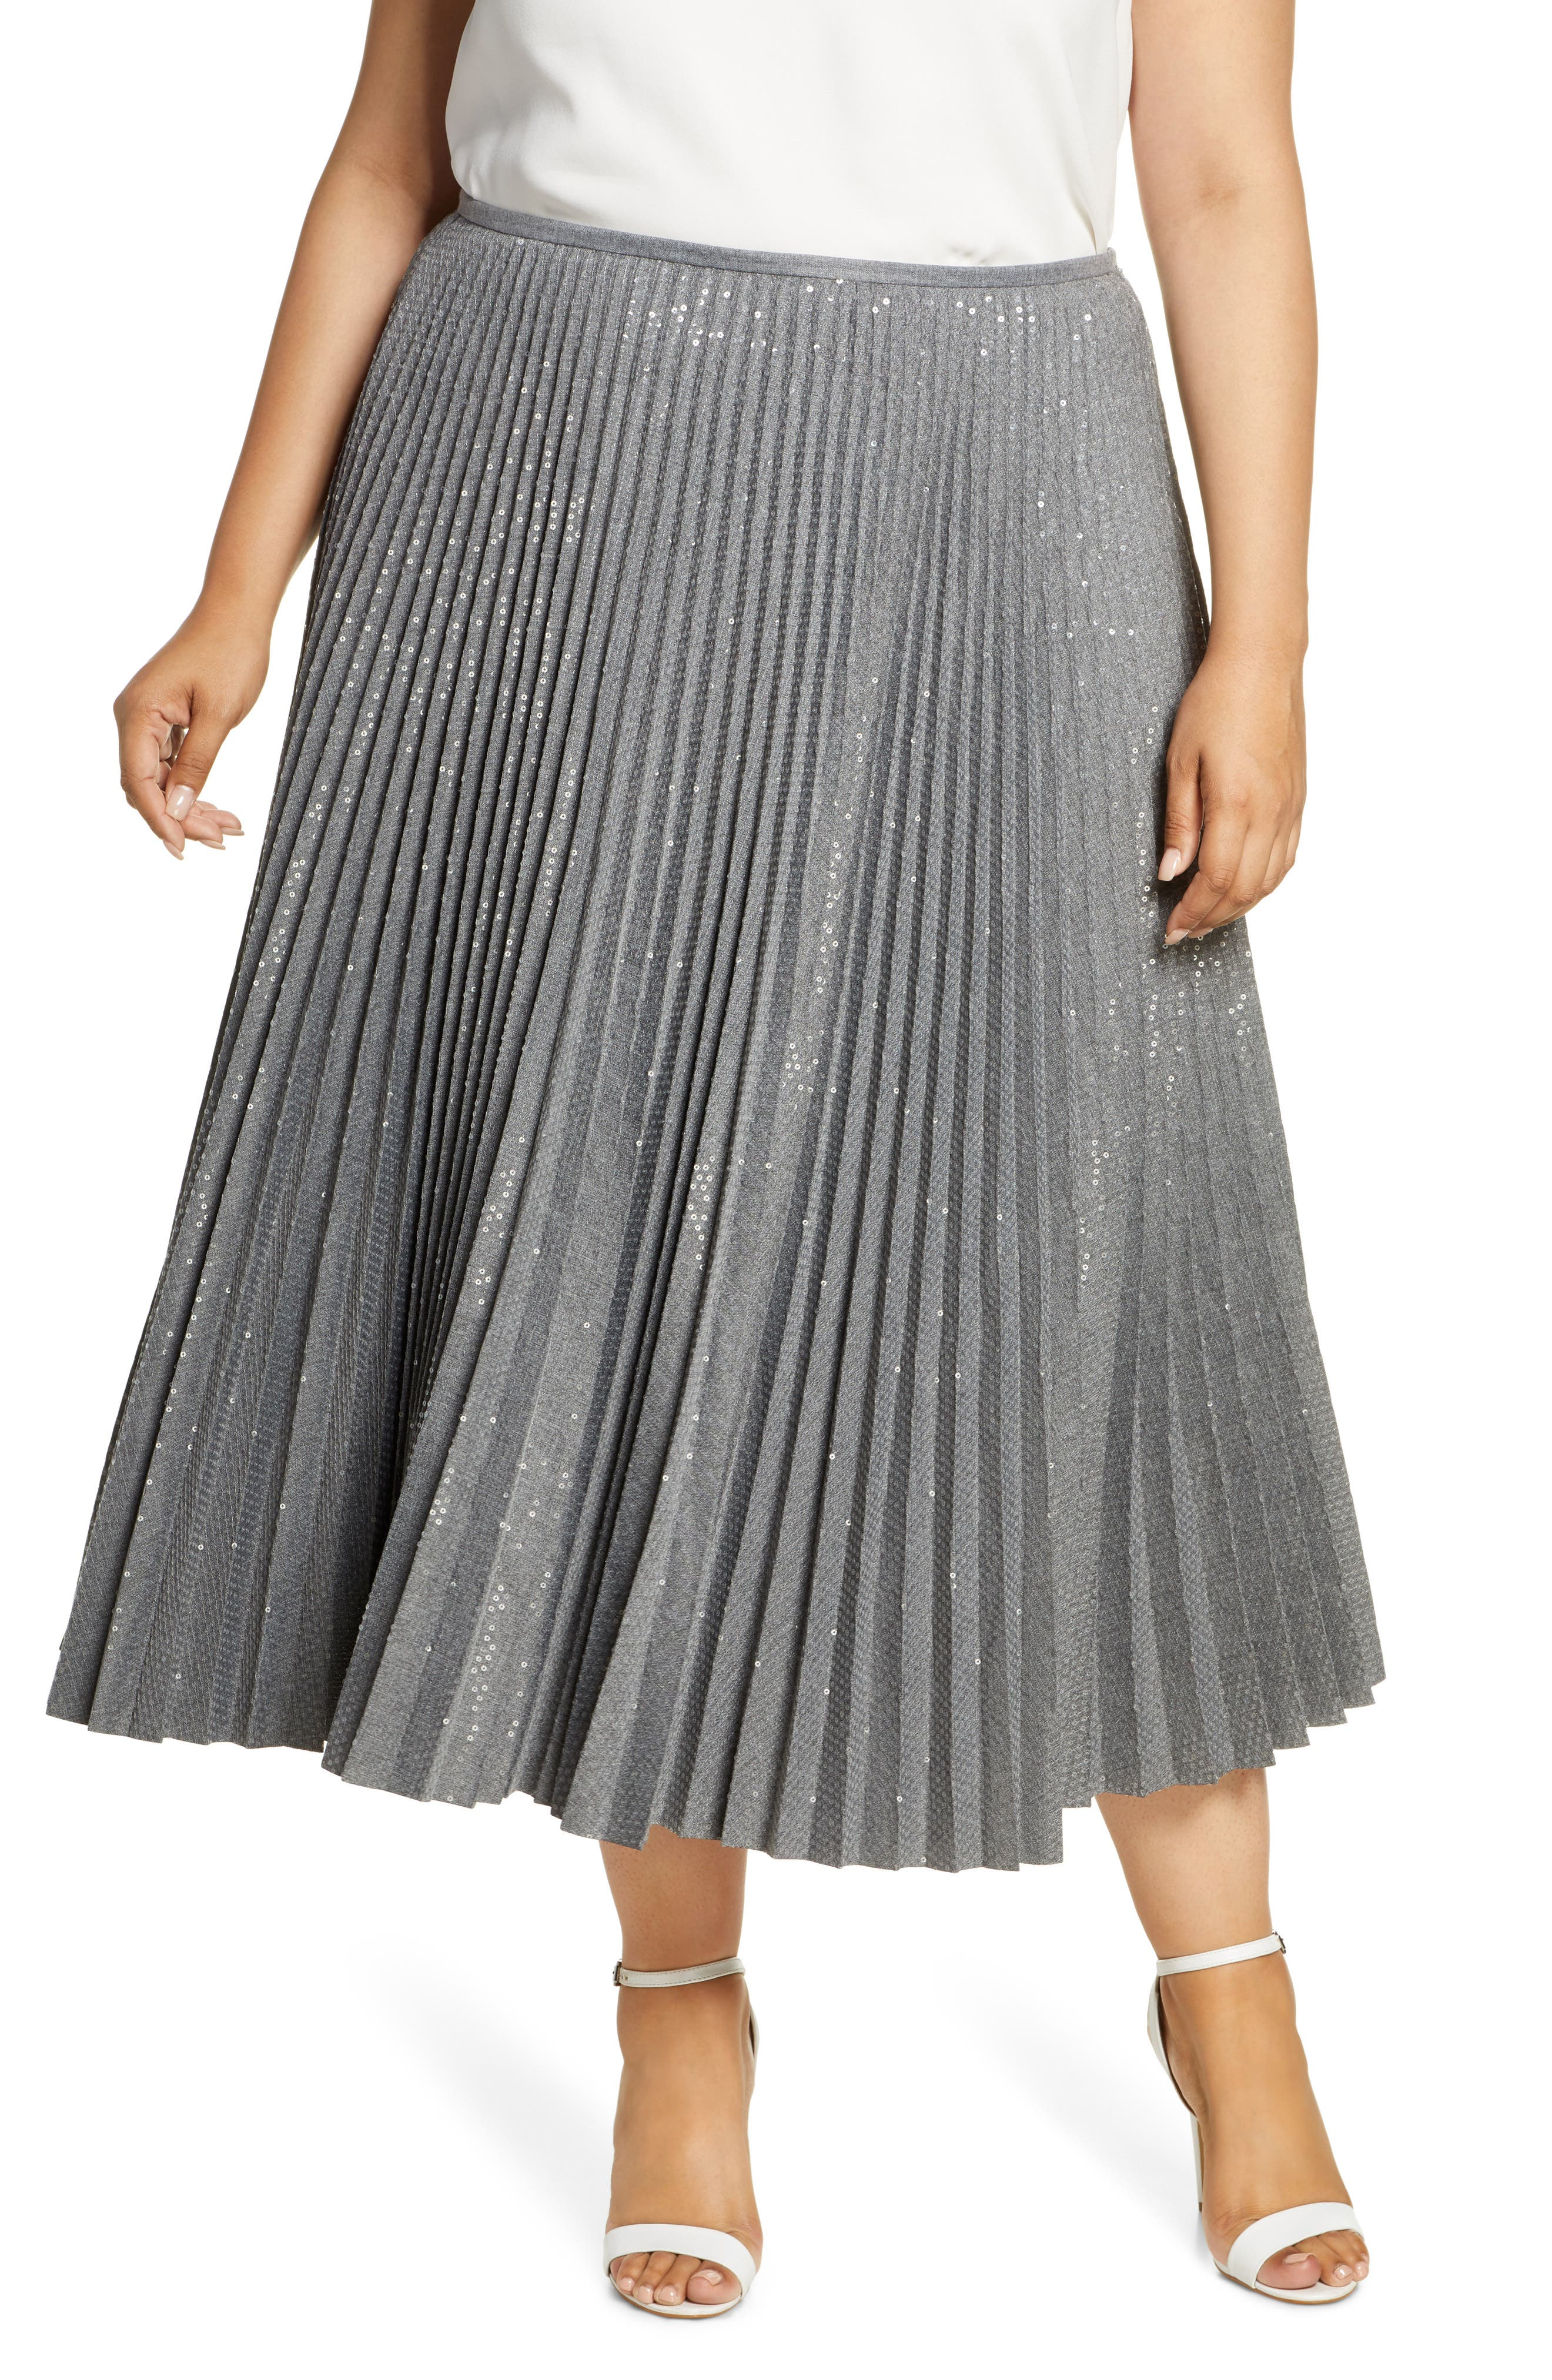 60s Skirts | 70s Hippie Skirts, Jumper Dresses Plus Size Womens Lafayette 148 New York Jahira Sequin Pleated Midi Skirt $848.00 AT vintagedancer.com